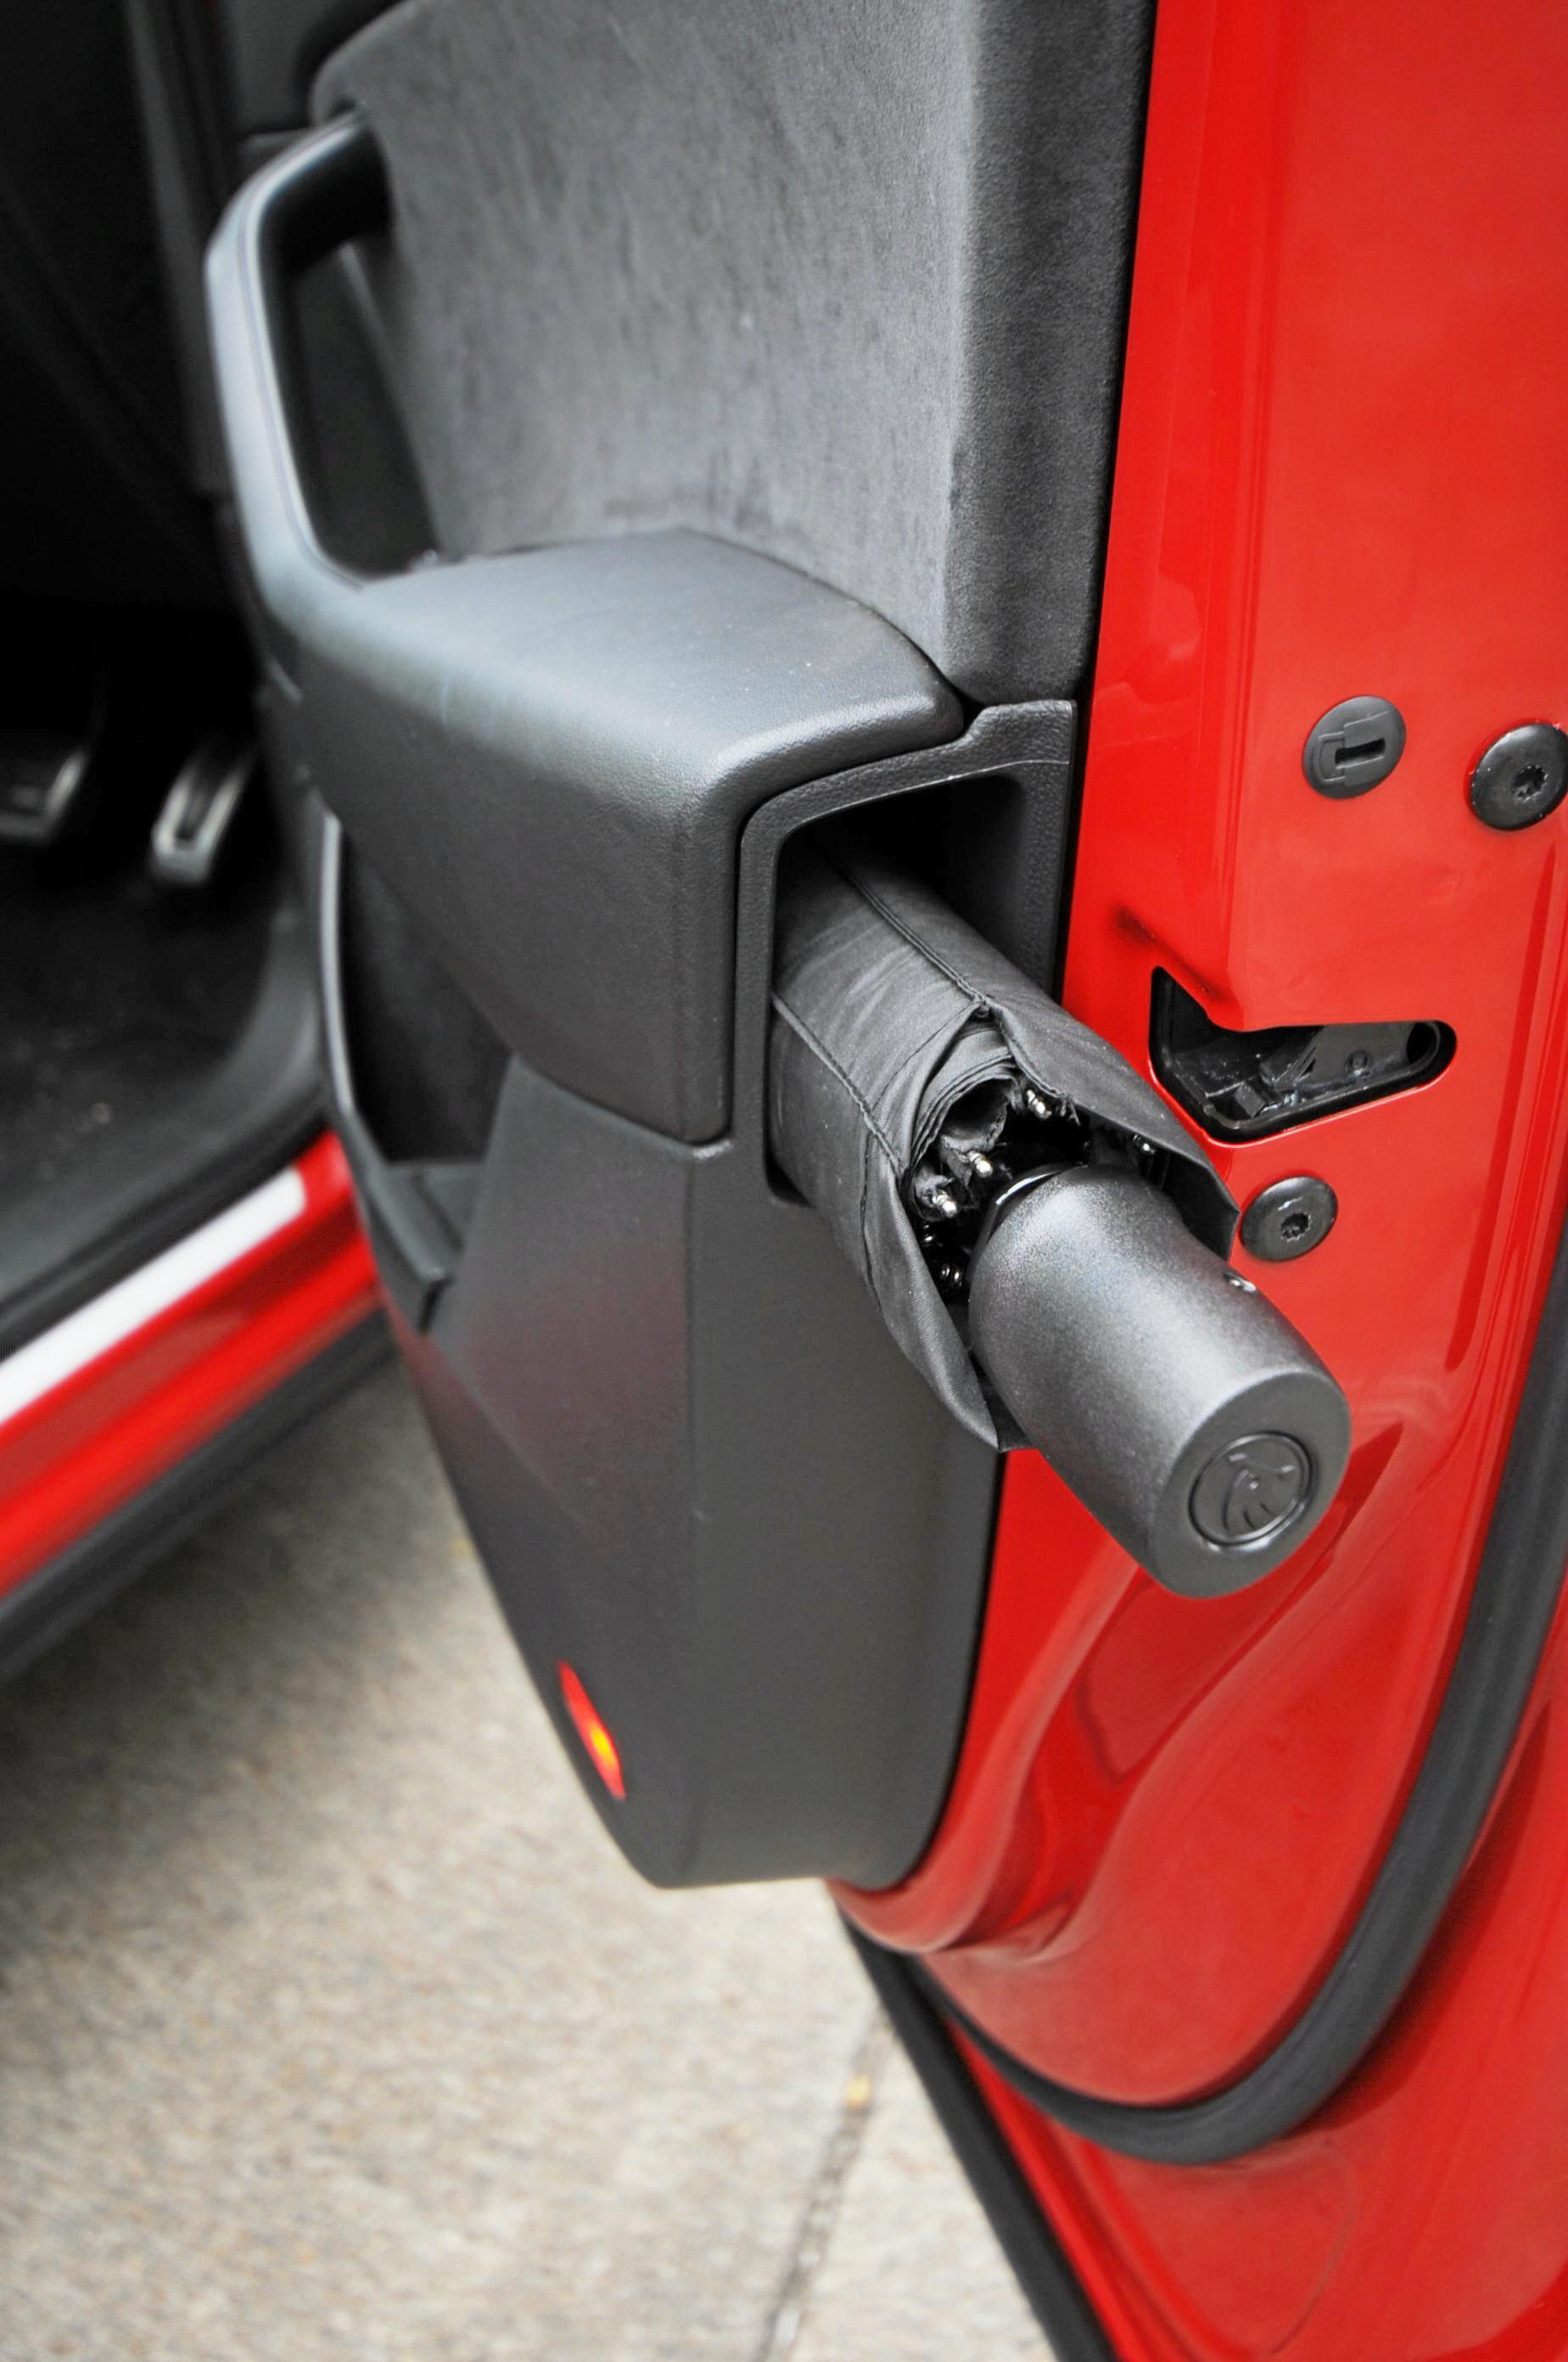 The Skoda Kodiaq Sportline has a 2.0-litre  turbocharged petrol engine under the bonnet.